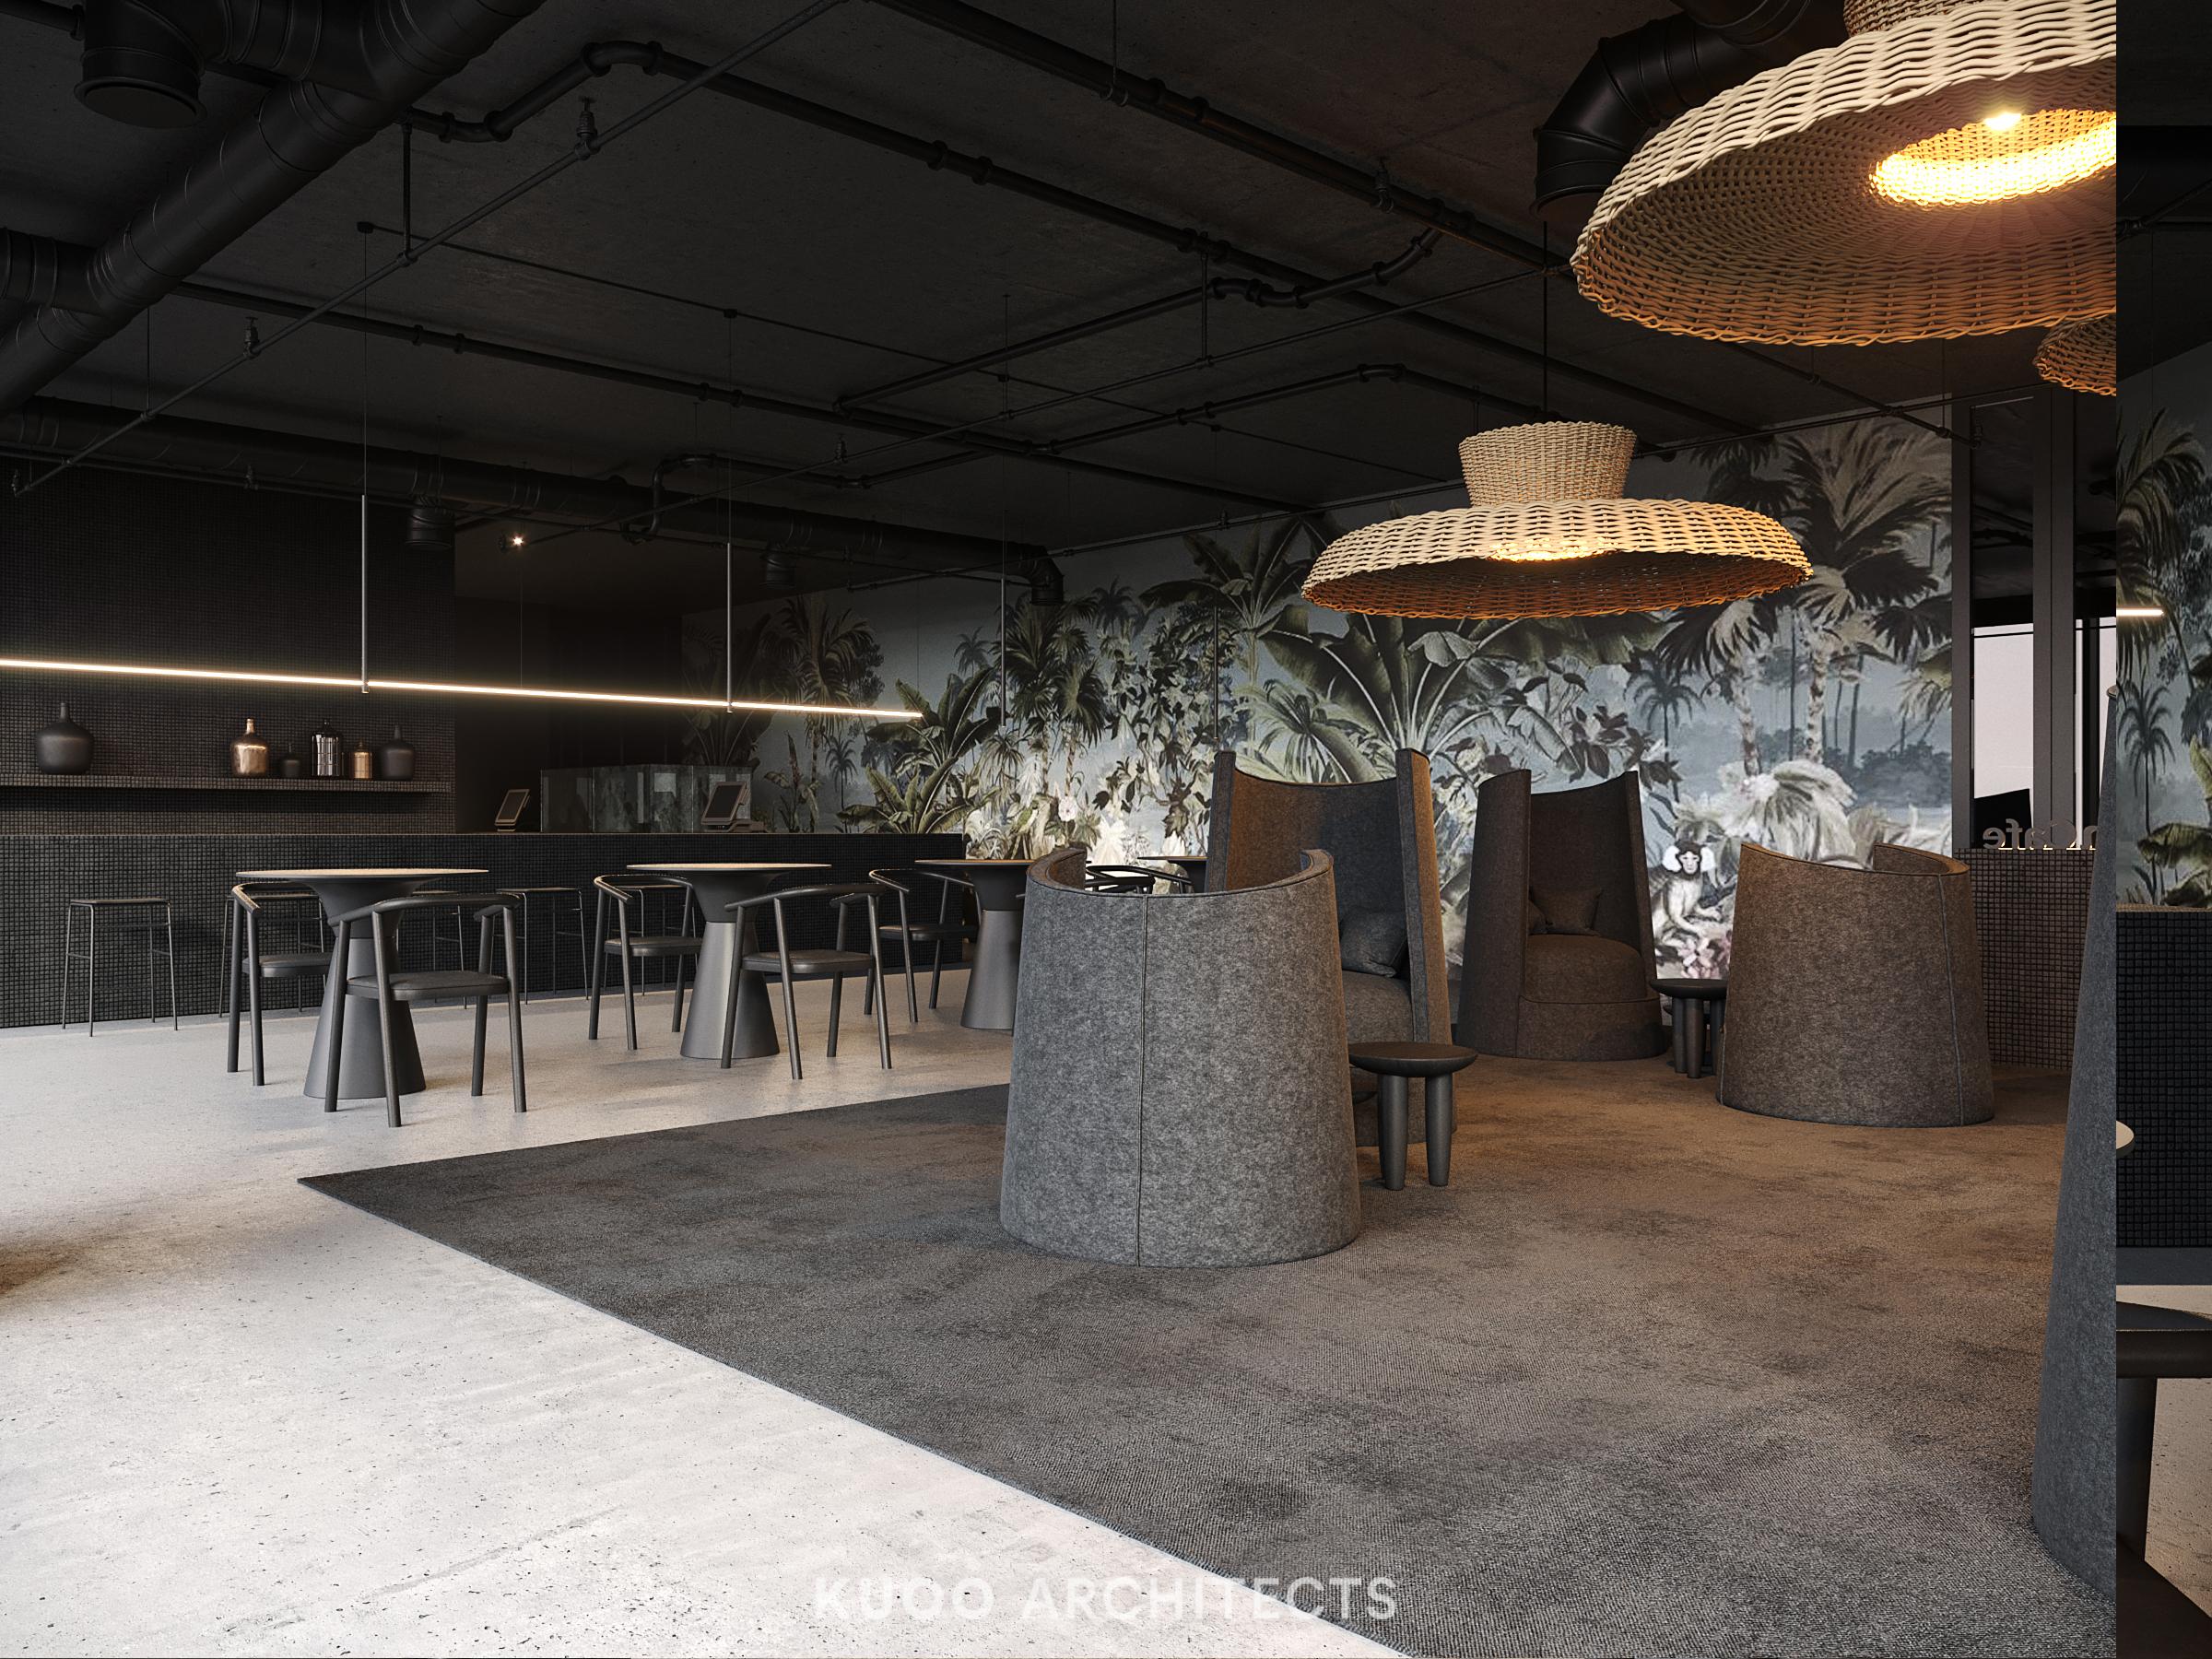 kuoo_architects_mcafe_1